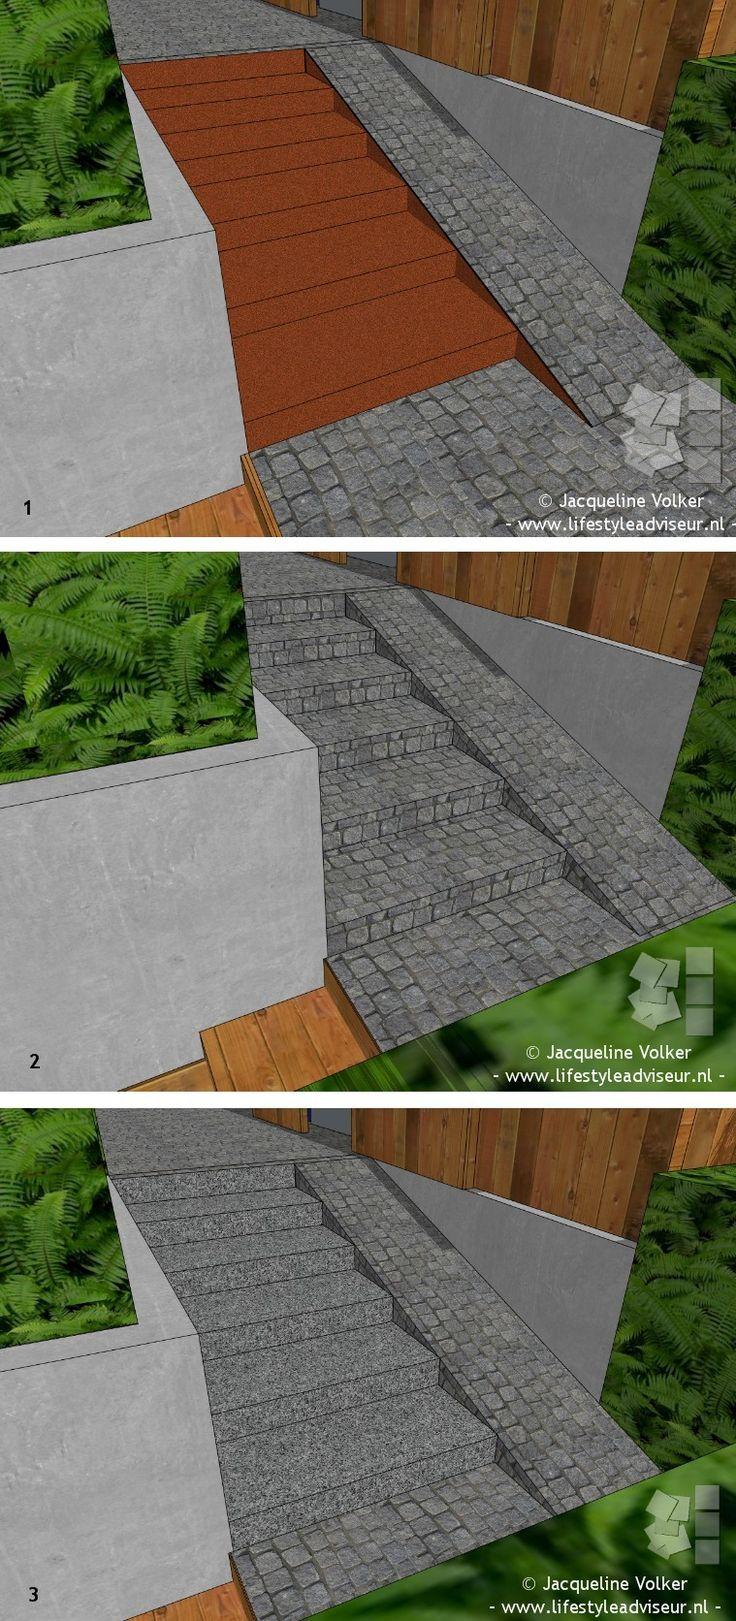 17 beste idee n over tuin trappen op pinterest buiten - Trap ontwerpen ...